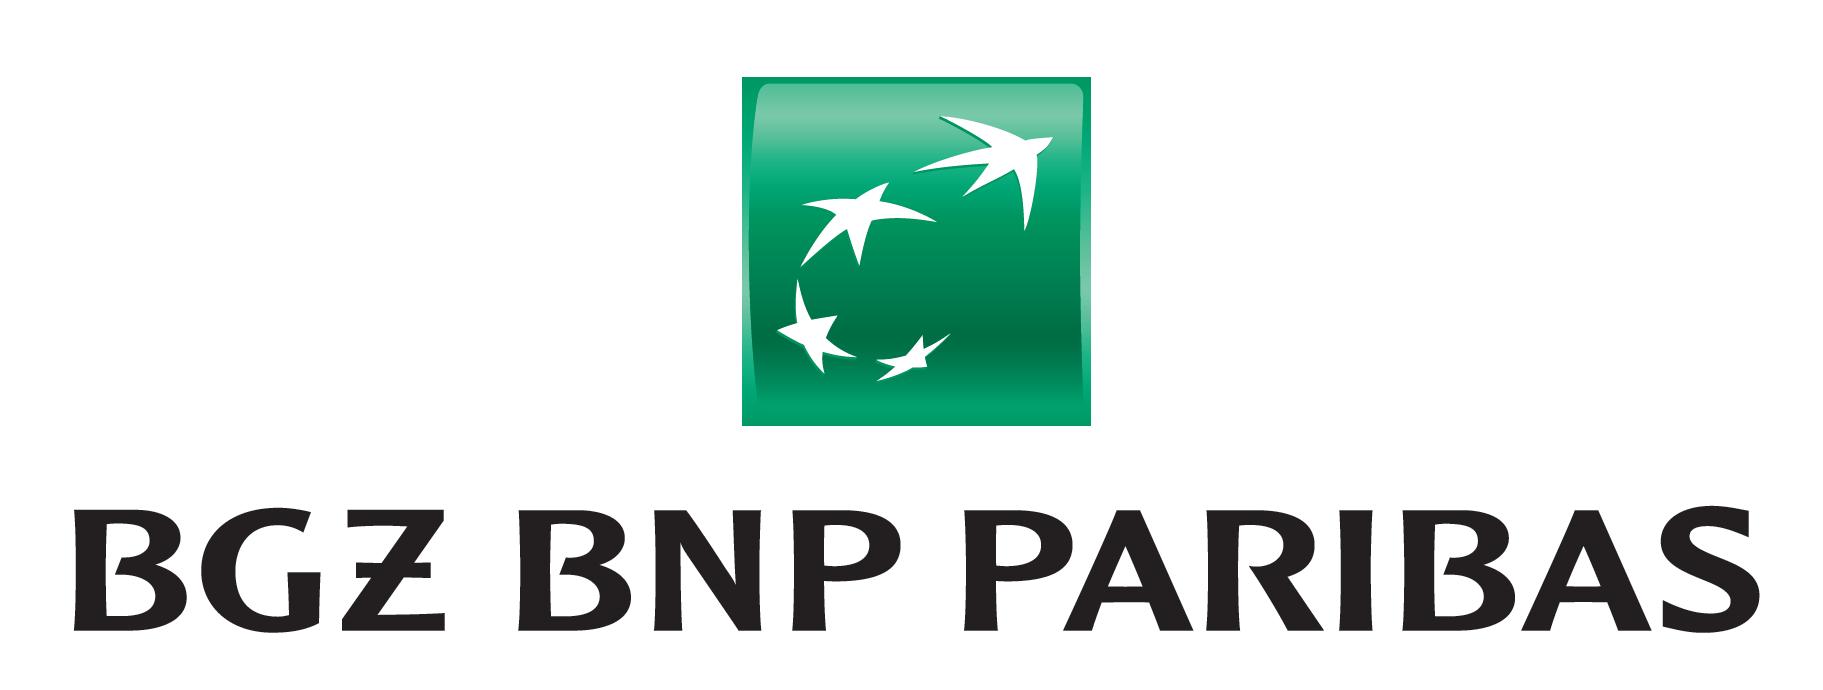 BGŻ-BNP-Paribas